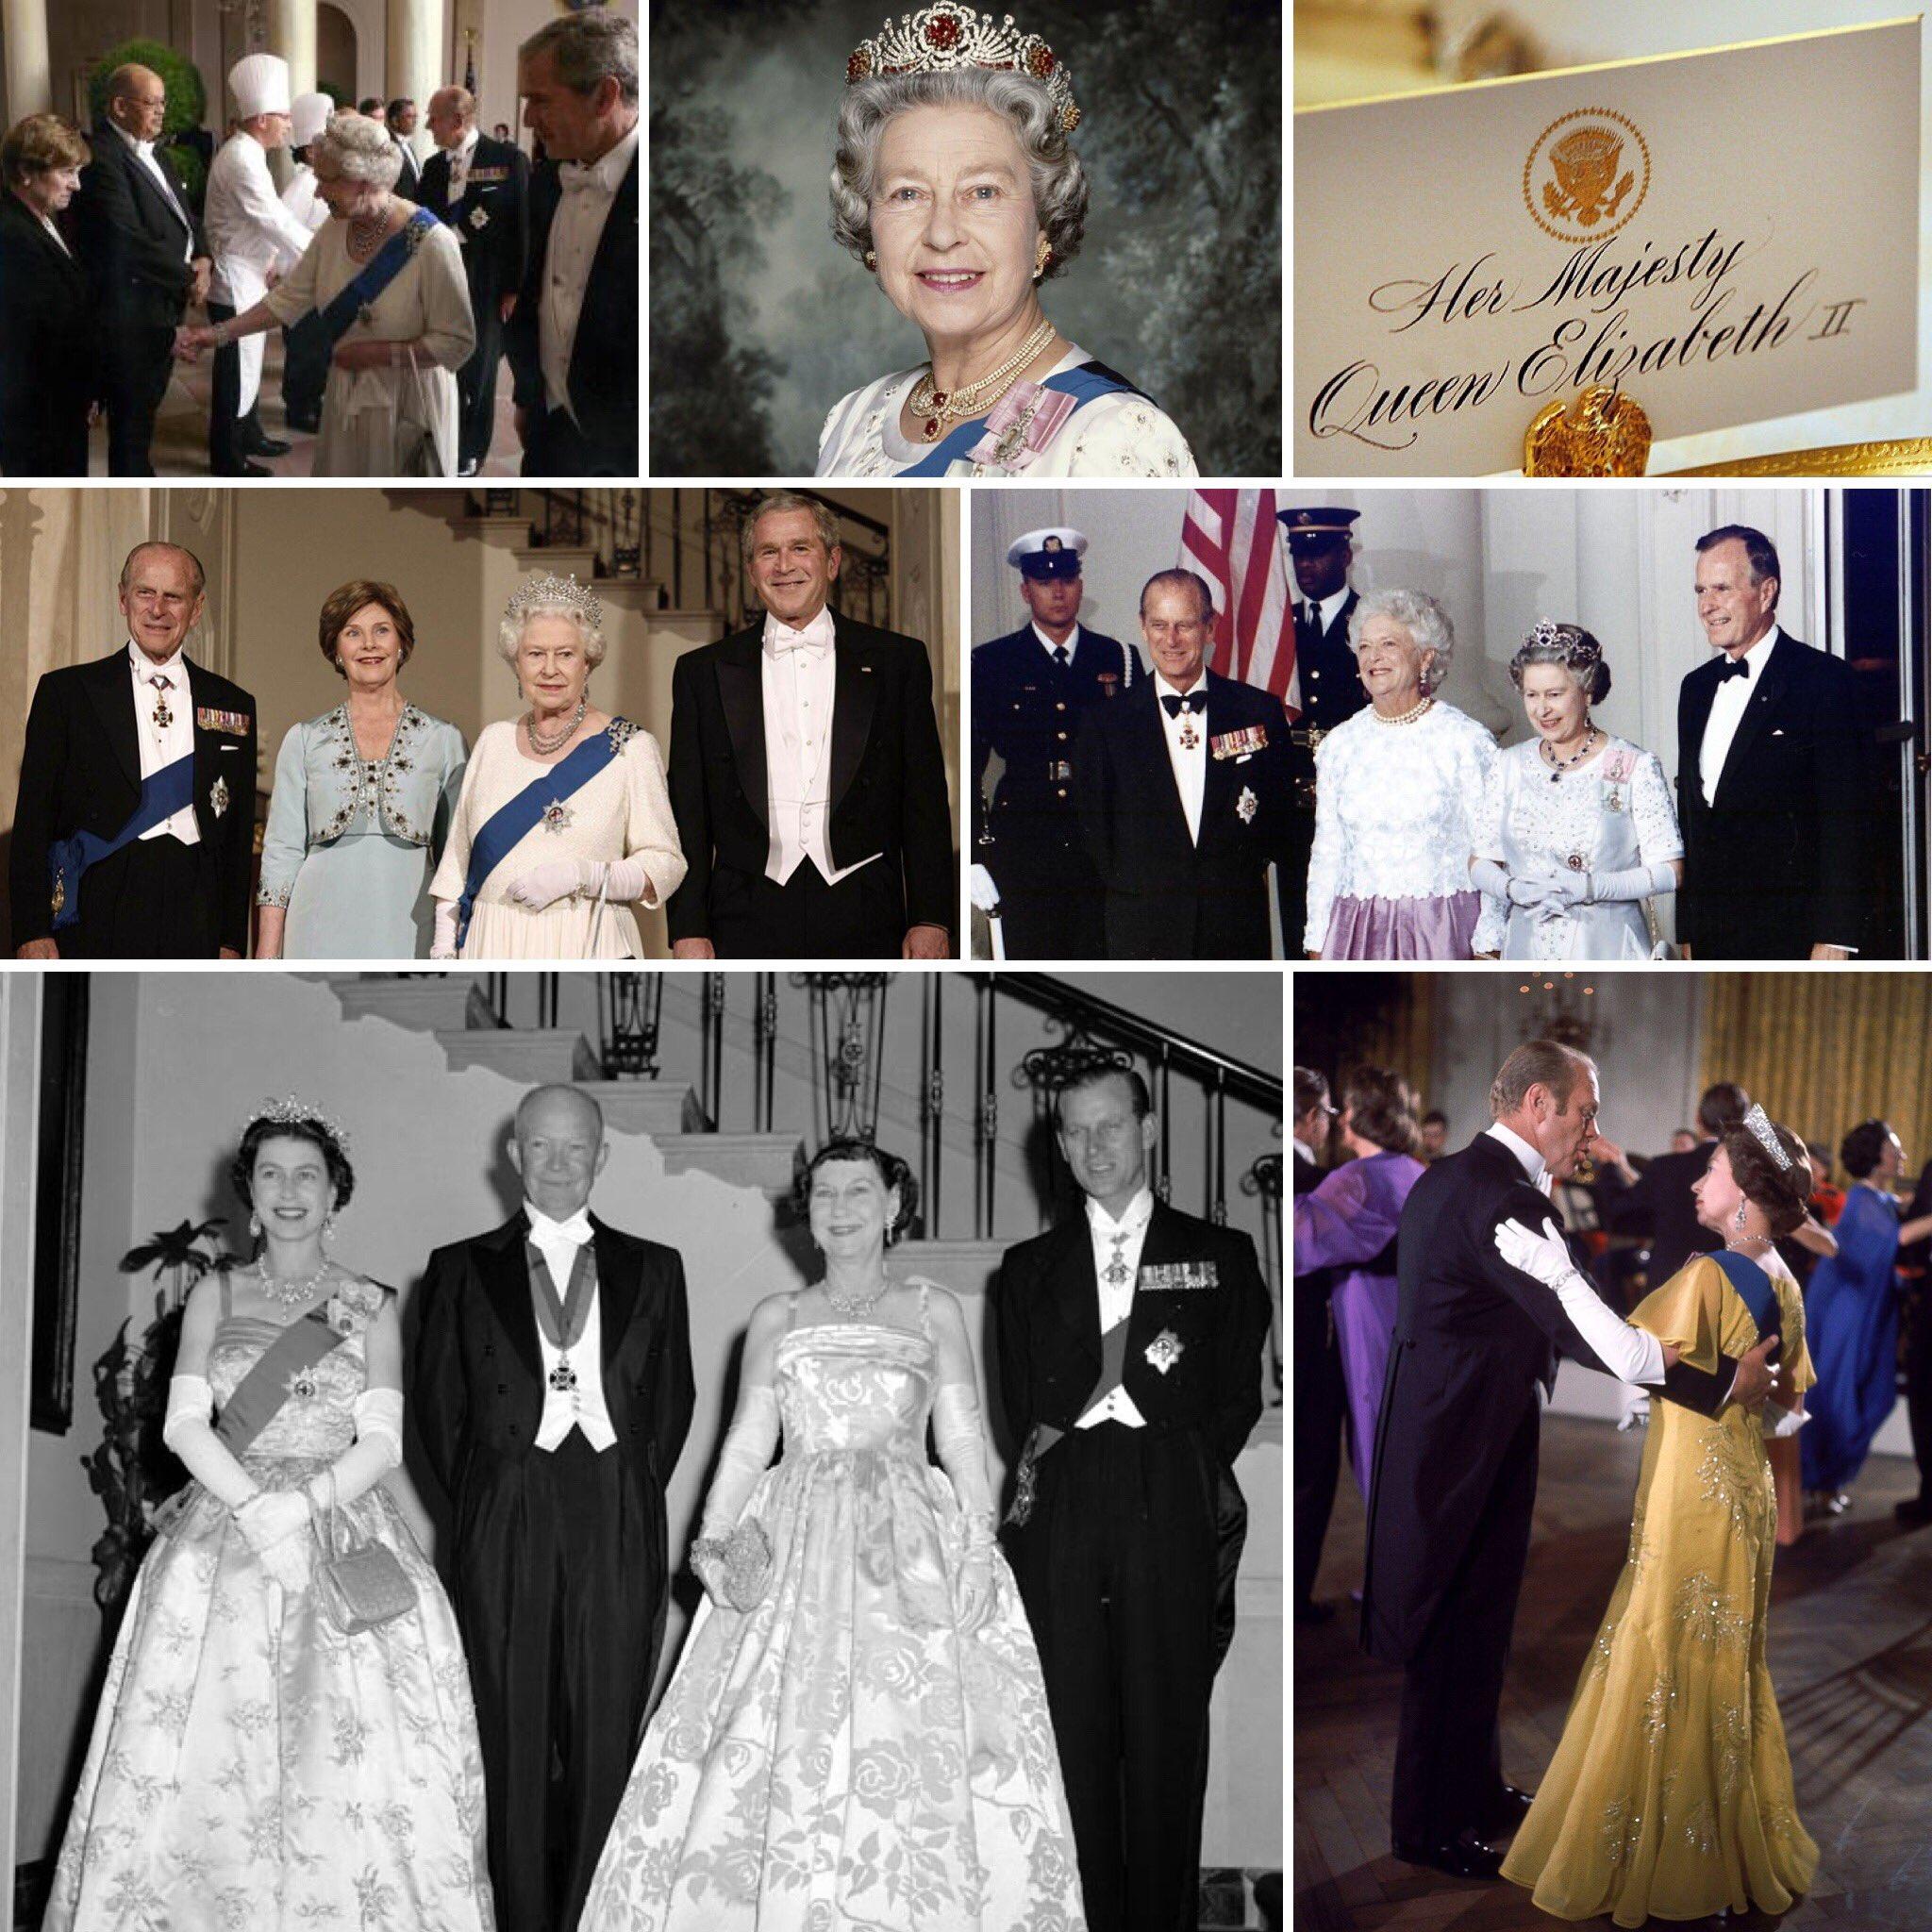 Happy 90th Birthday to   #QueenElizabeth!  #Queenat90 @laurawbush @Ford_Library @Bush41Library @IkeLibrary https://t.co/ckdCJ5Lucd